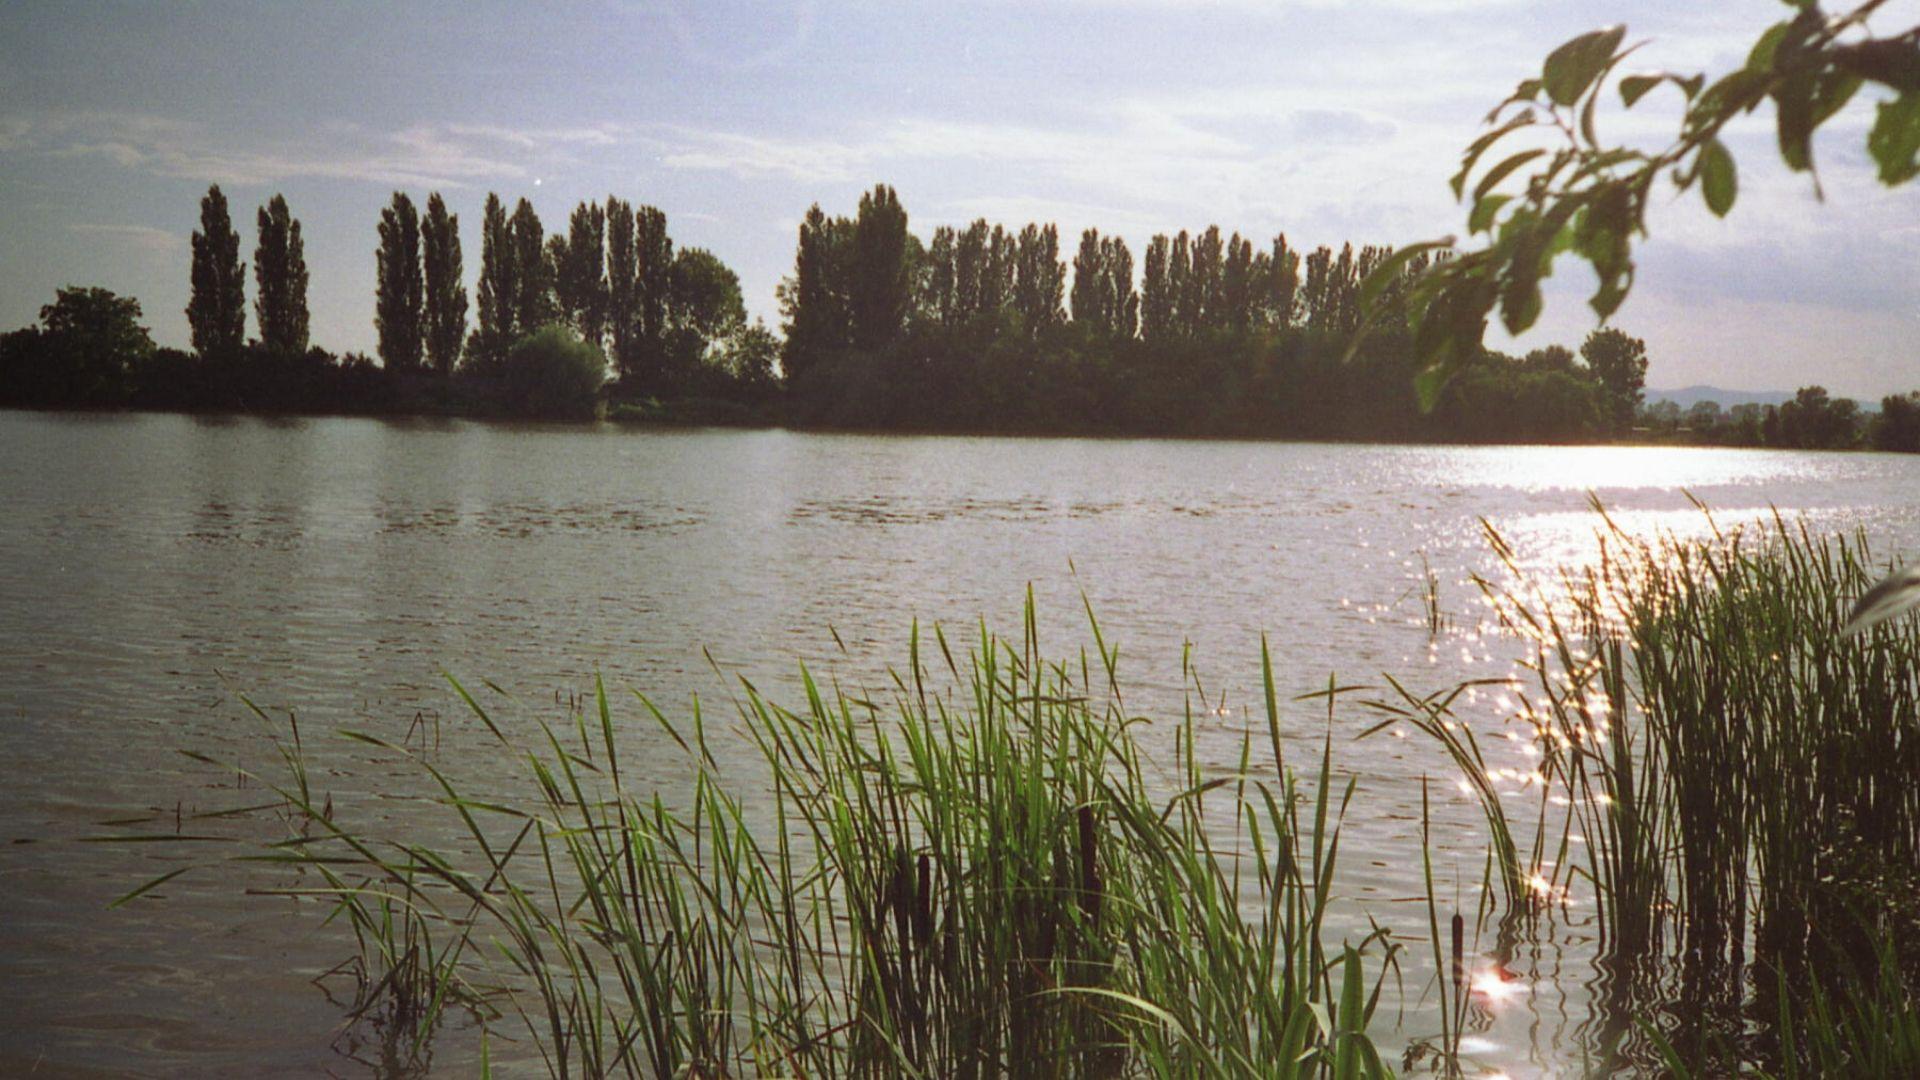 bývanie v Trnave Trnavské rybníky